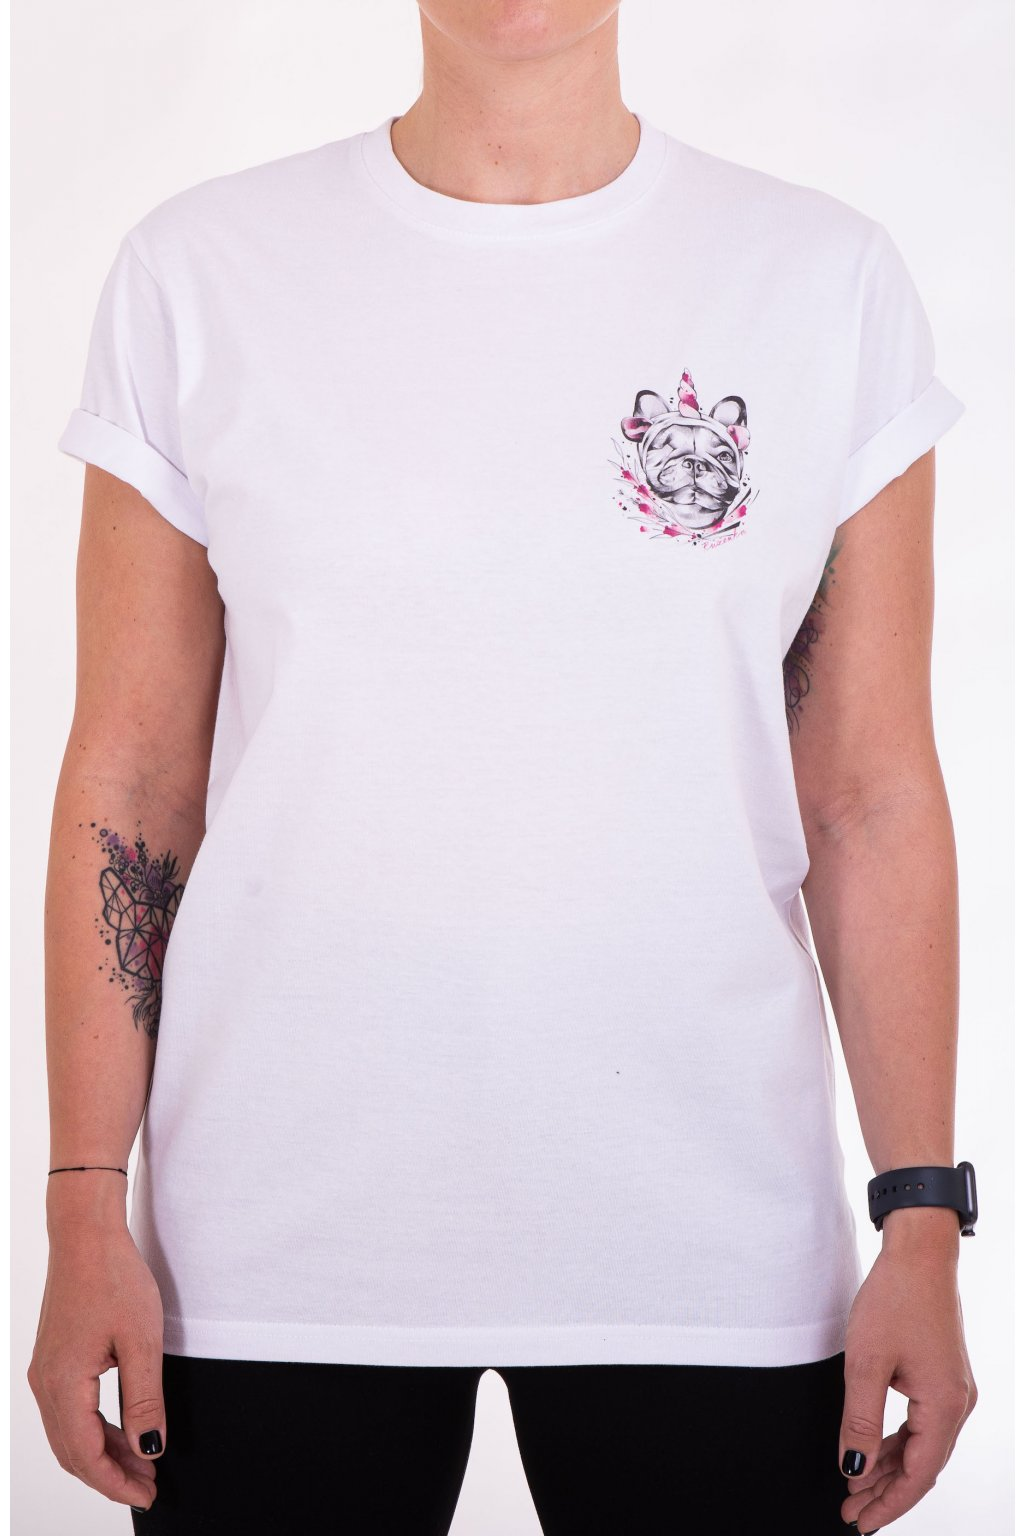 Unisex tričko RŮŽENKA